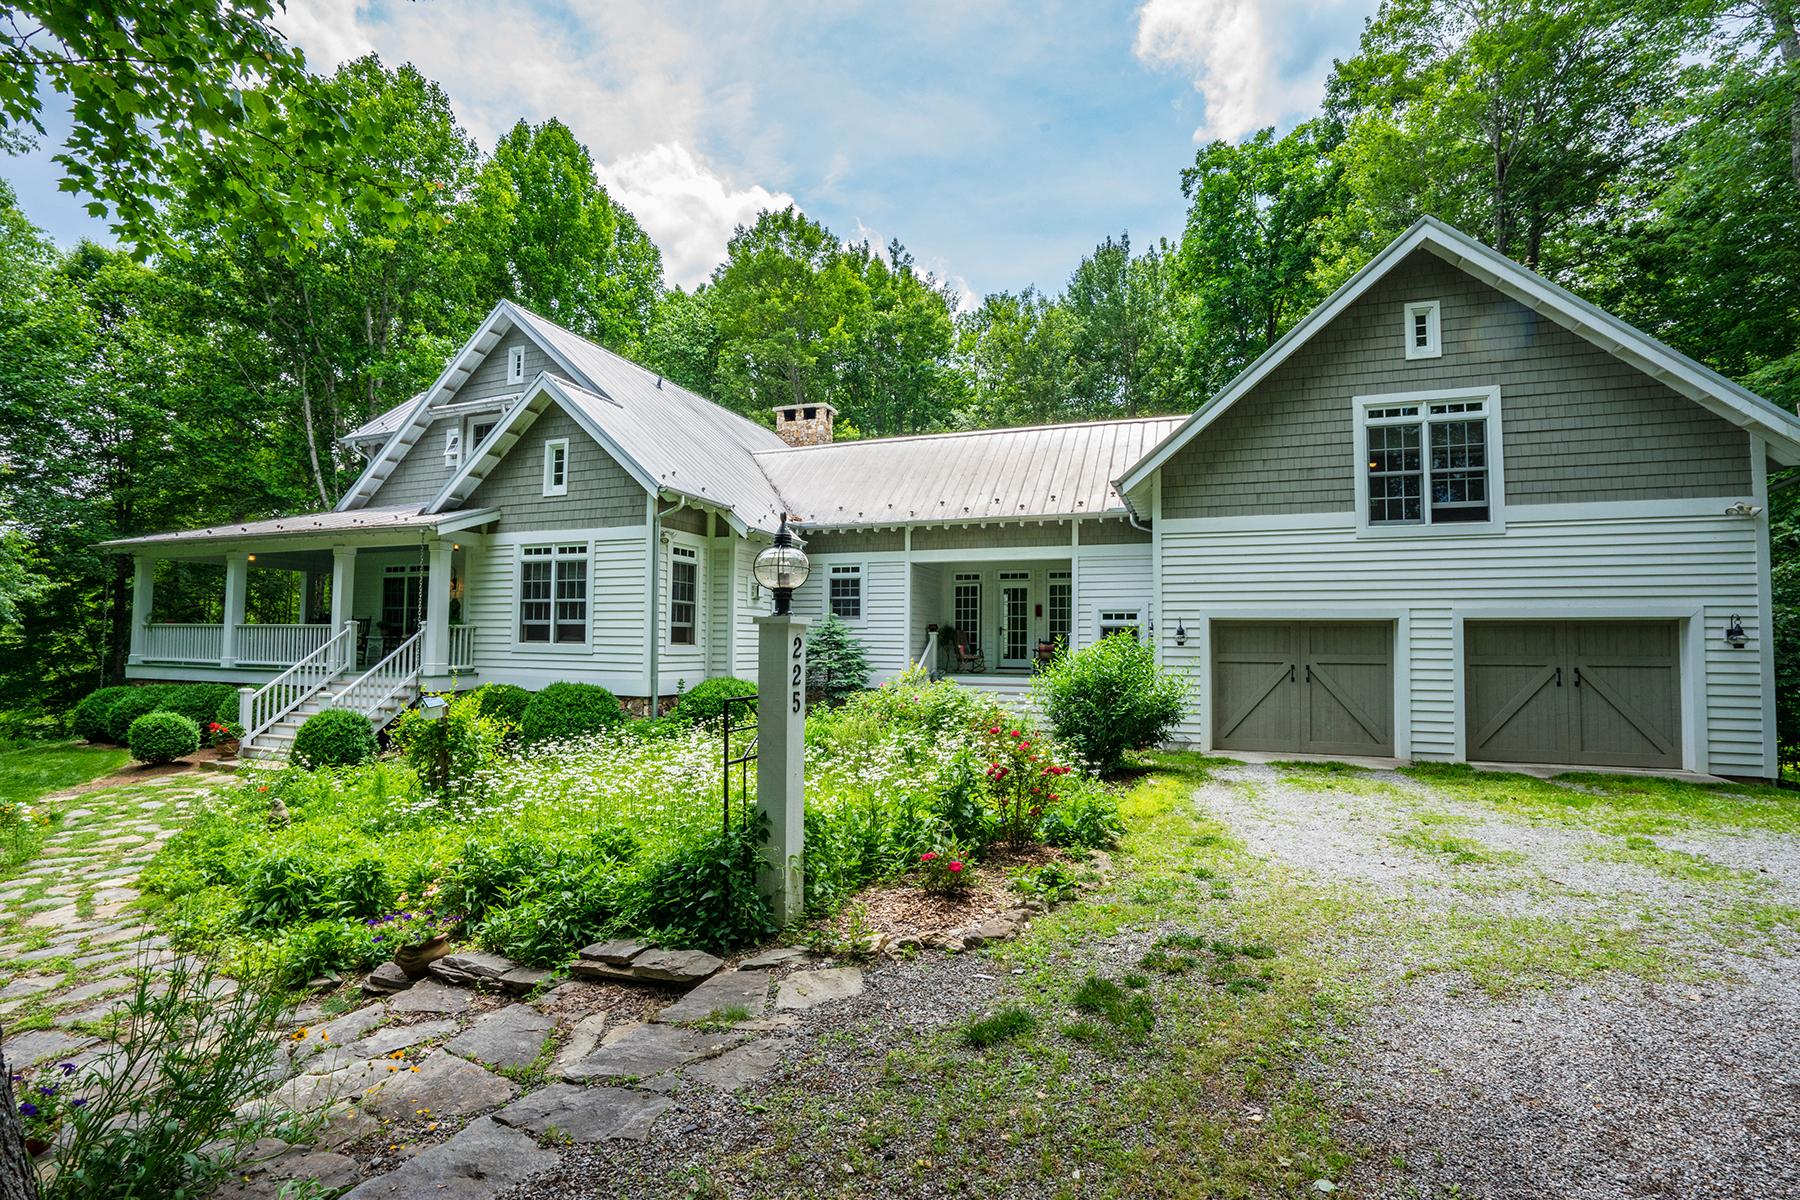 獨棟家庭住宅 為 出售 在 CRUMPLER - THE RIDGE AT CHESTNUT HILL 225 Deer Thicket Ln Crumpler, 北卡羅來納州, 28617 美國